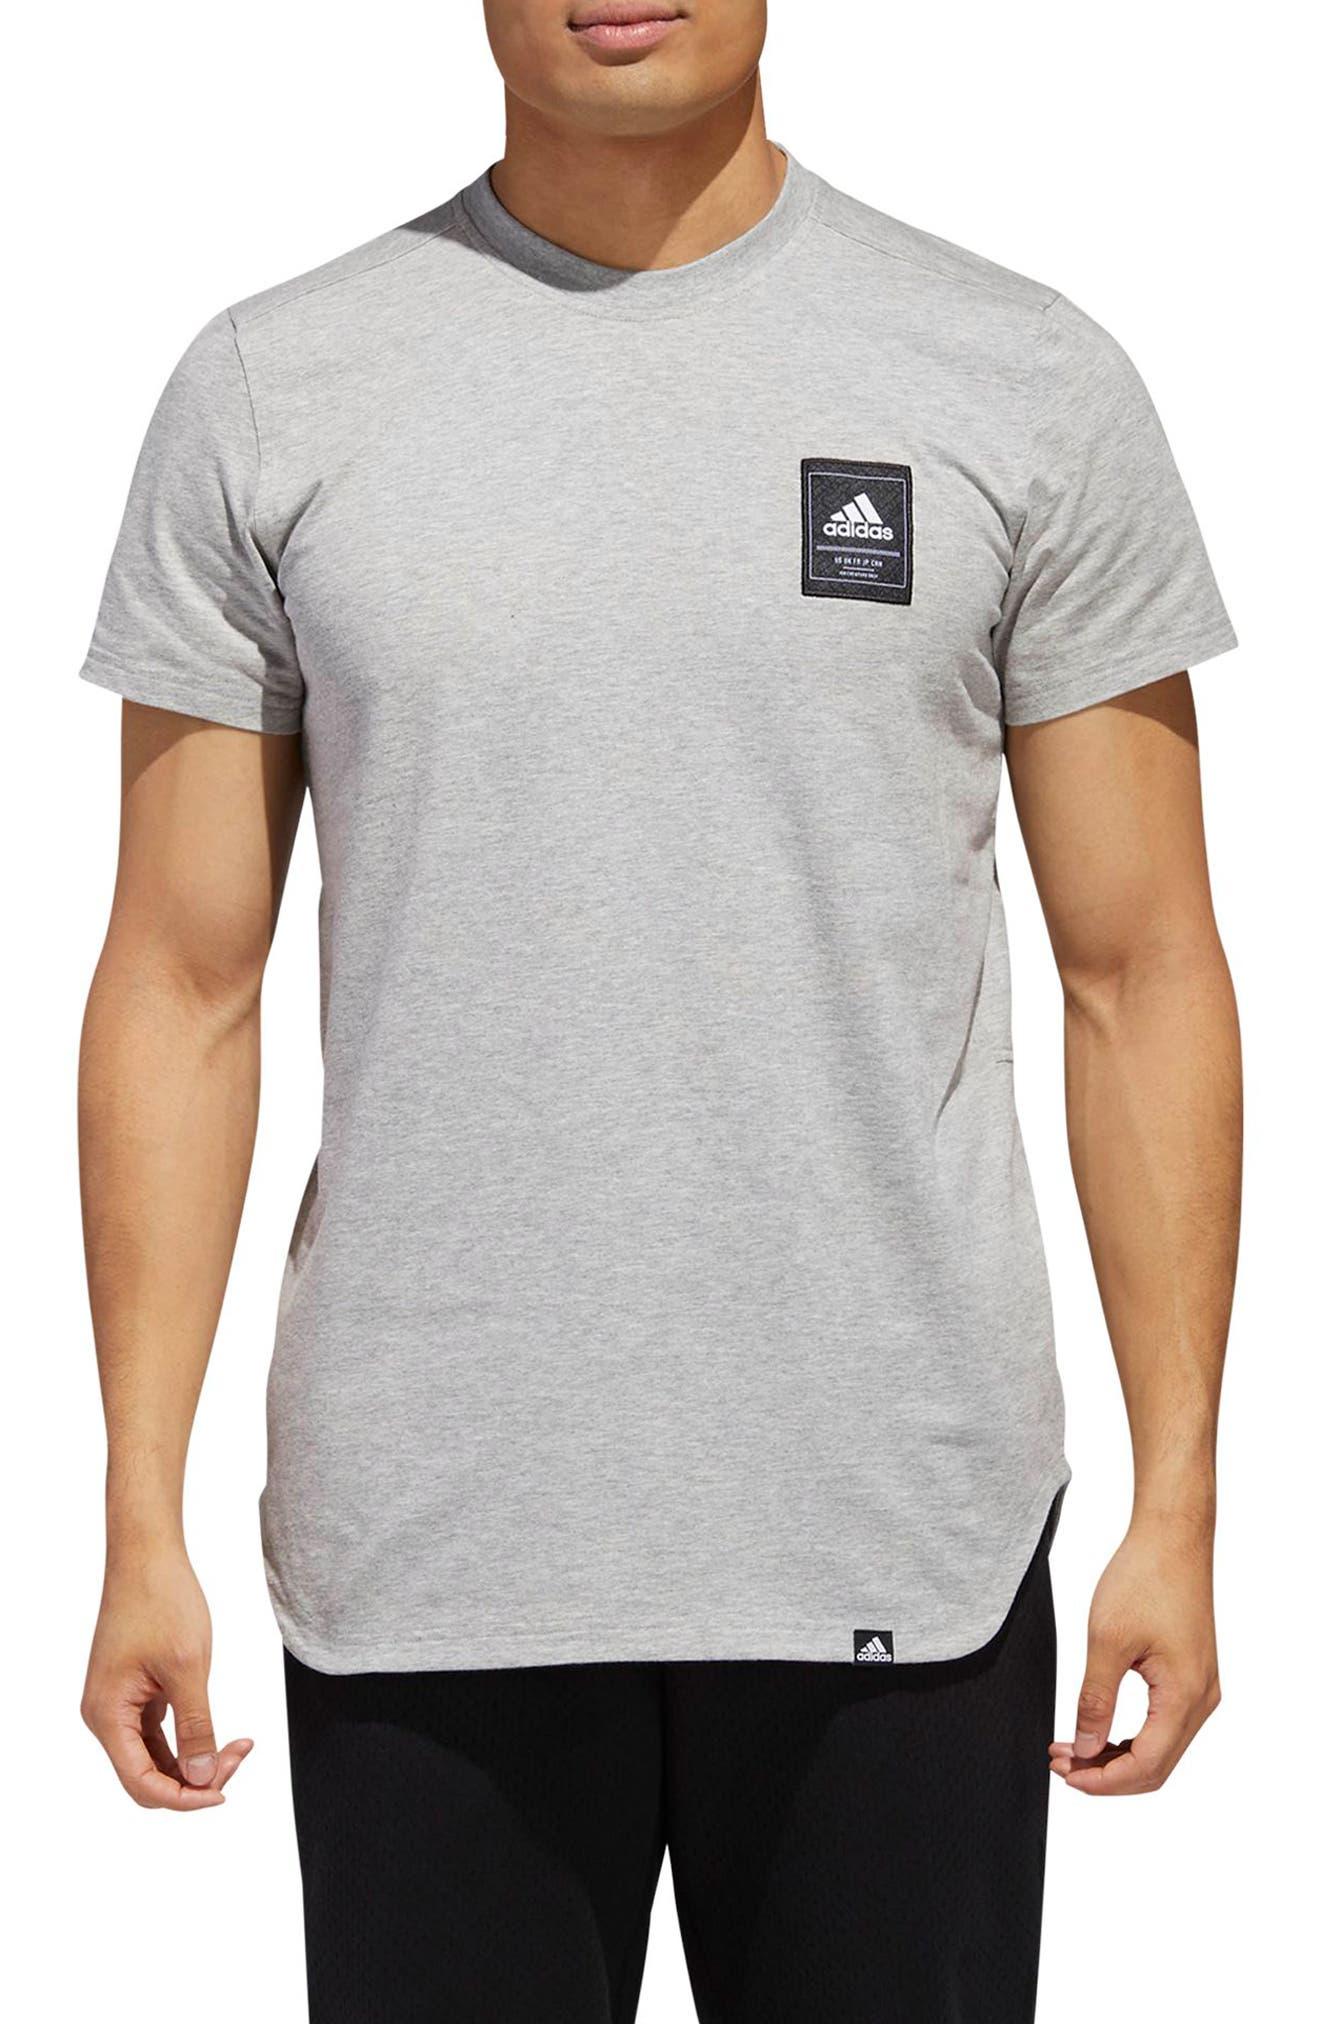 Scoop International T-Shirt,                         Main,                         color, MEDIUM GREY HEATHER